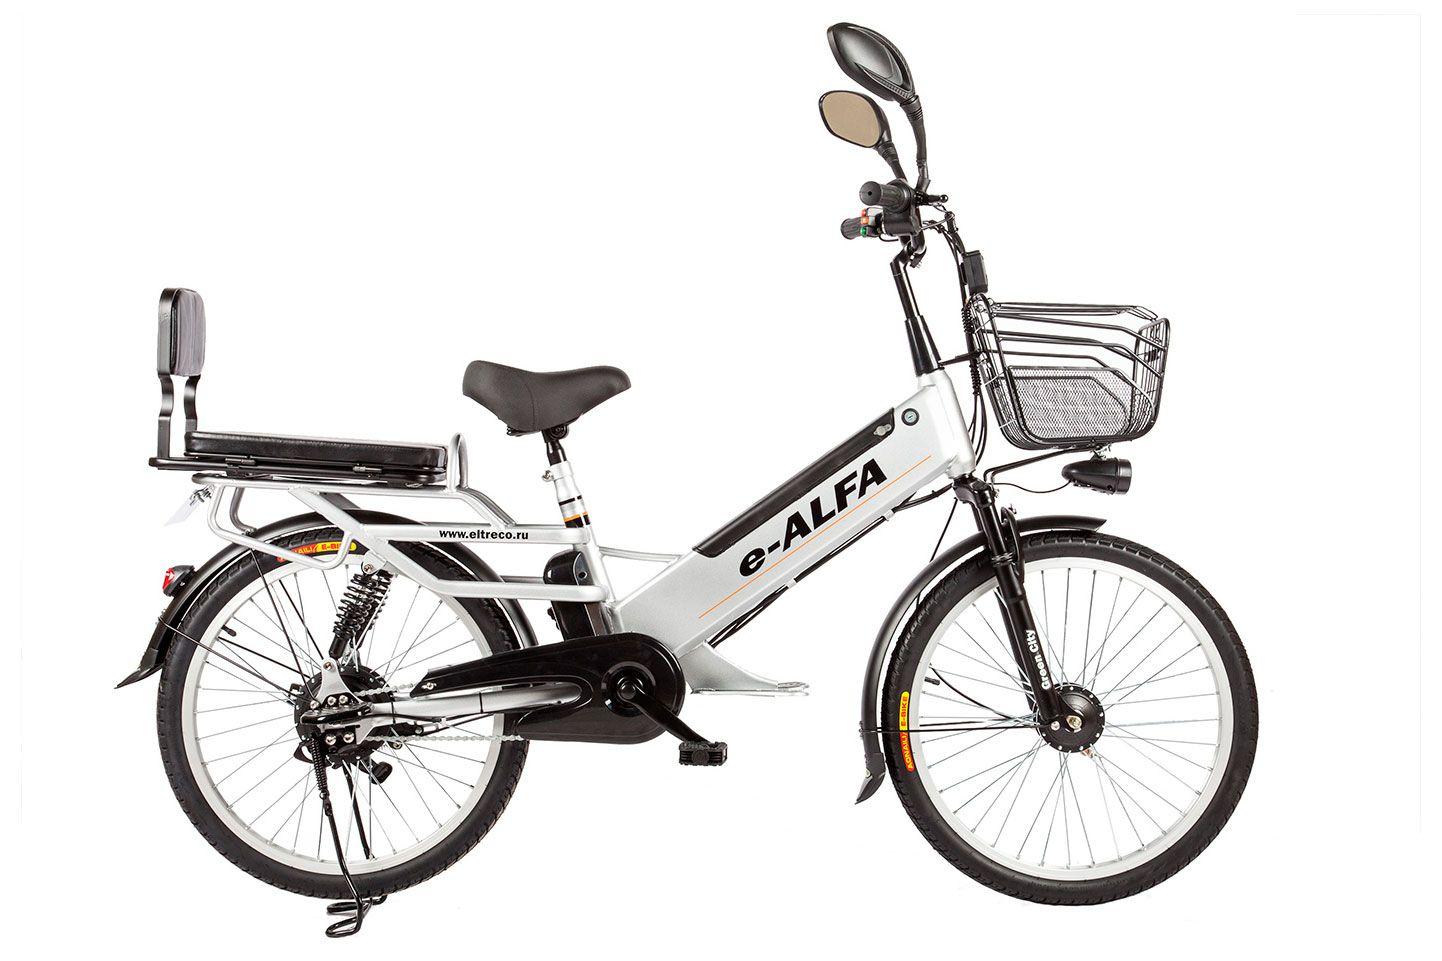 Велосипед Eltreco e-Alfa GL 2018 тормоза для велосипеда avid elixir e1